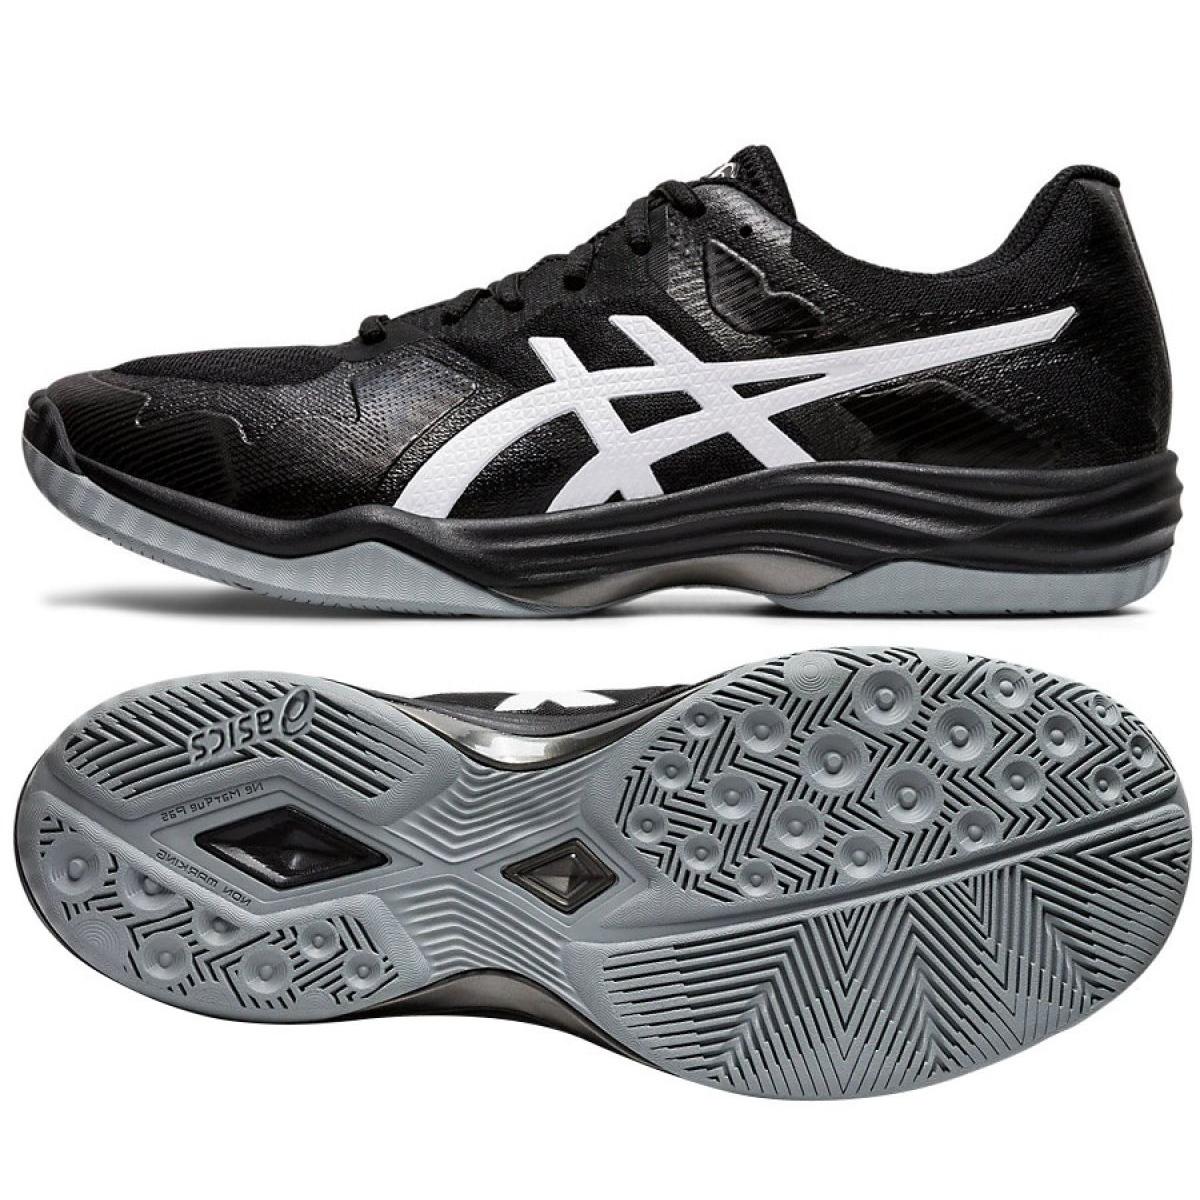 Asics Gel Tactic M 1071A031-003 shoes black black